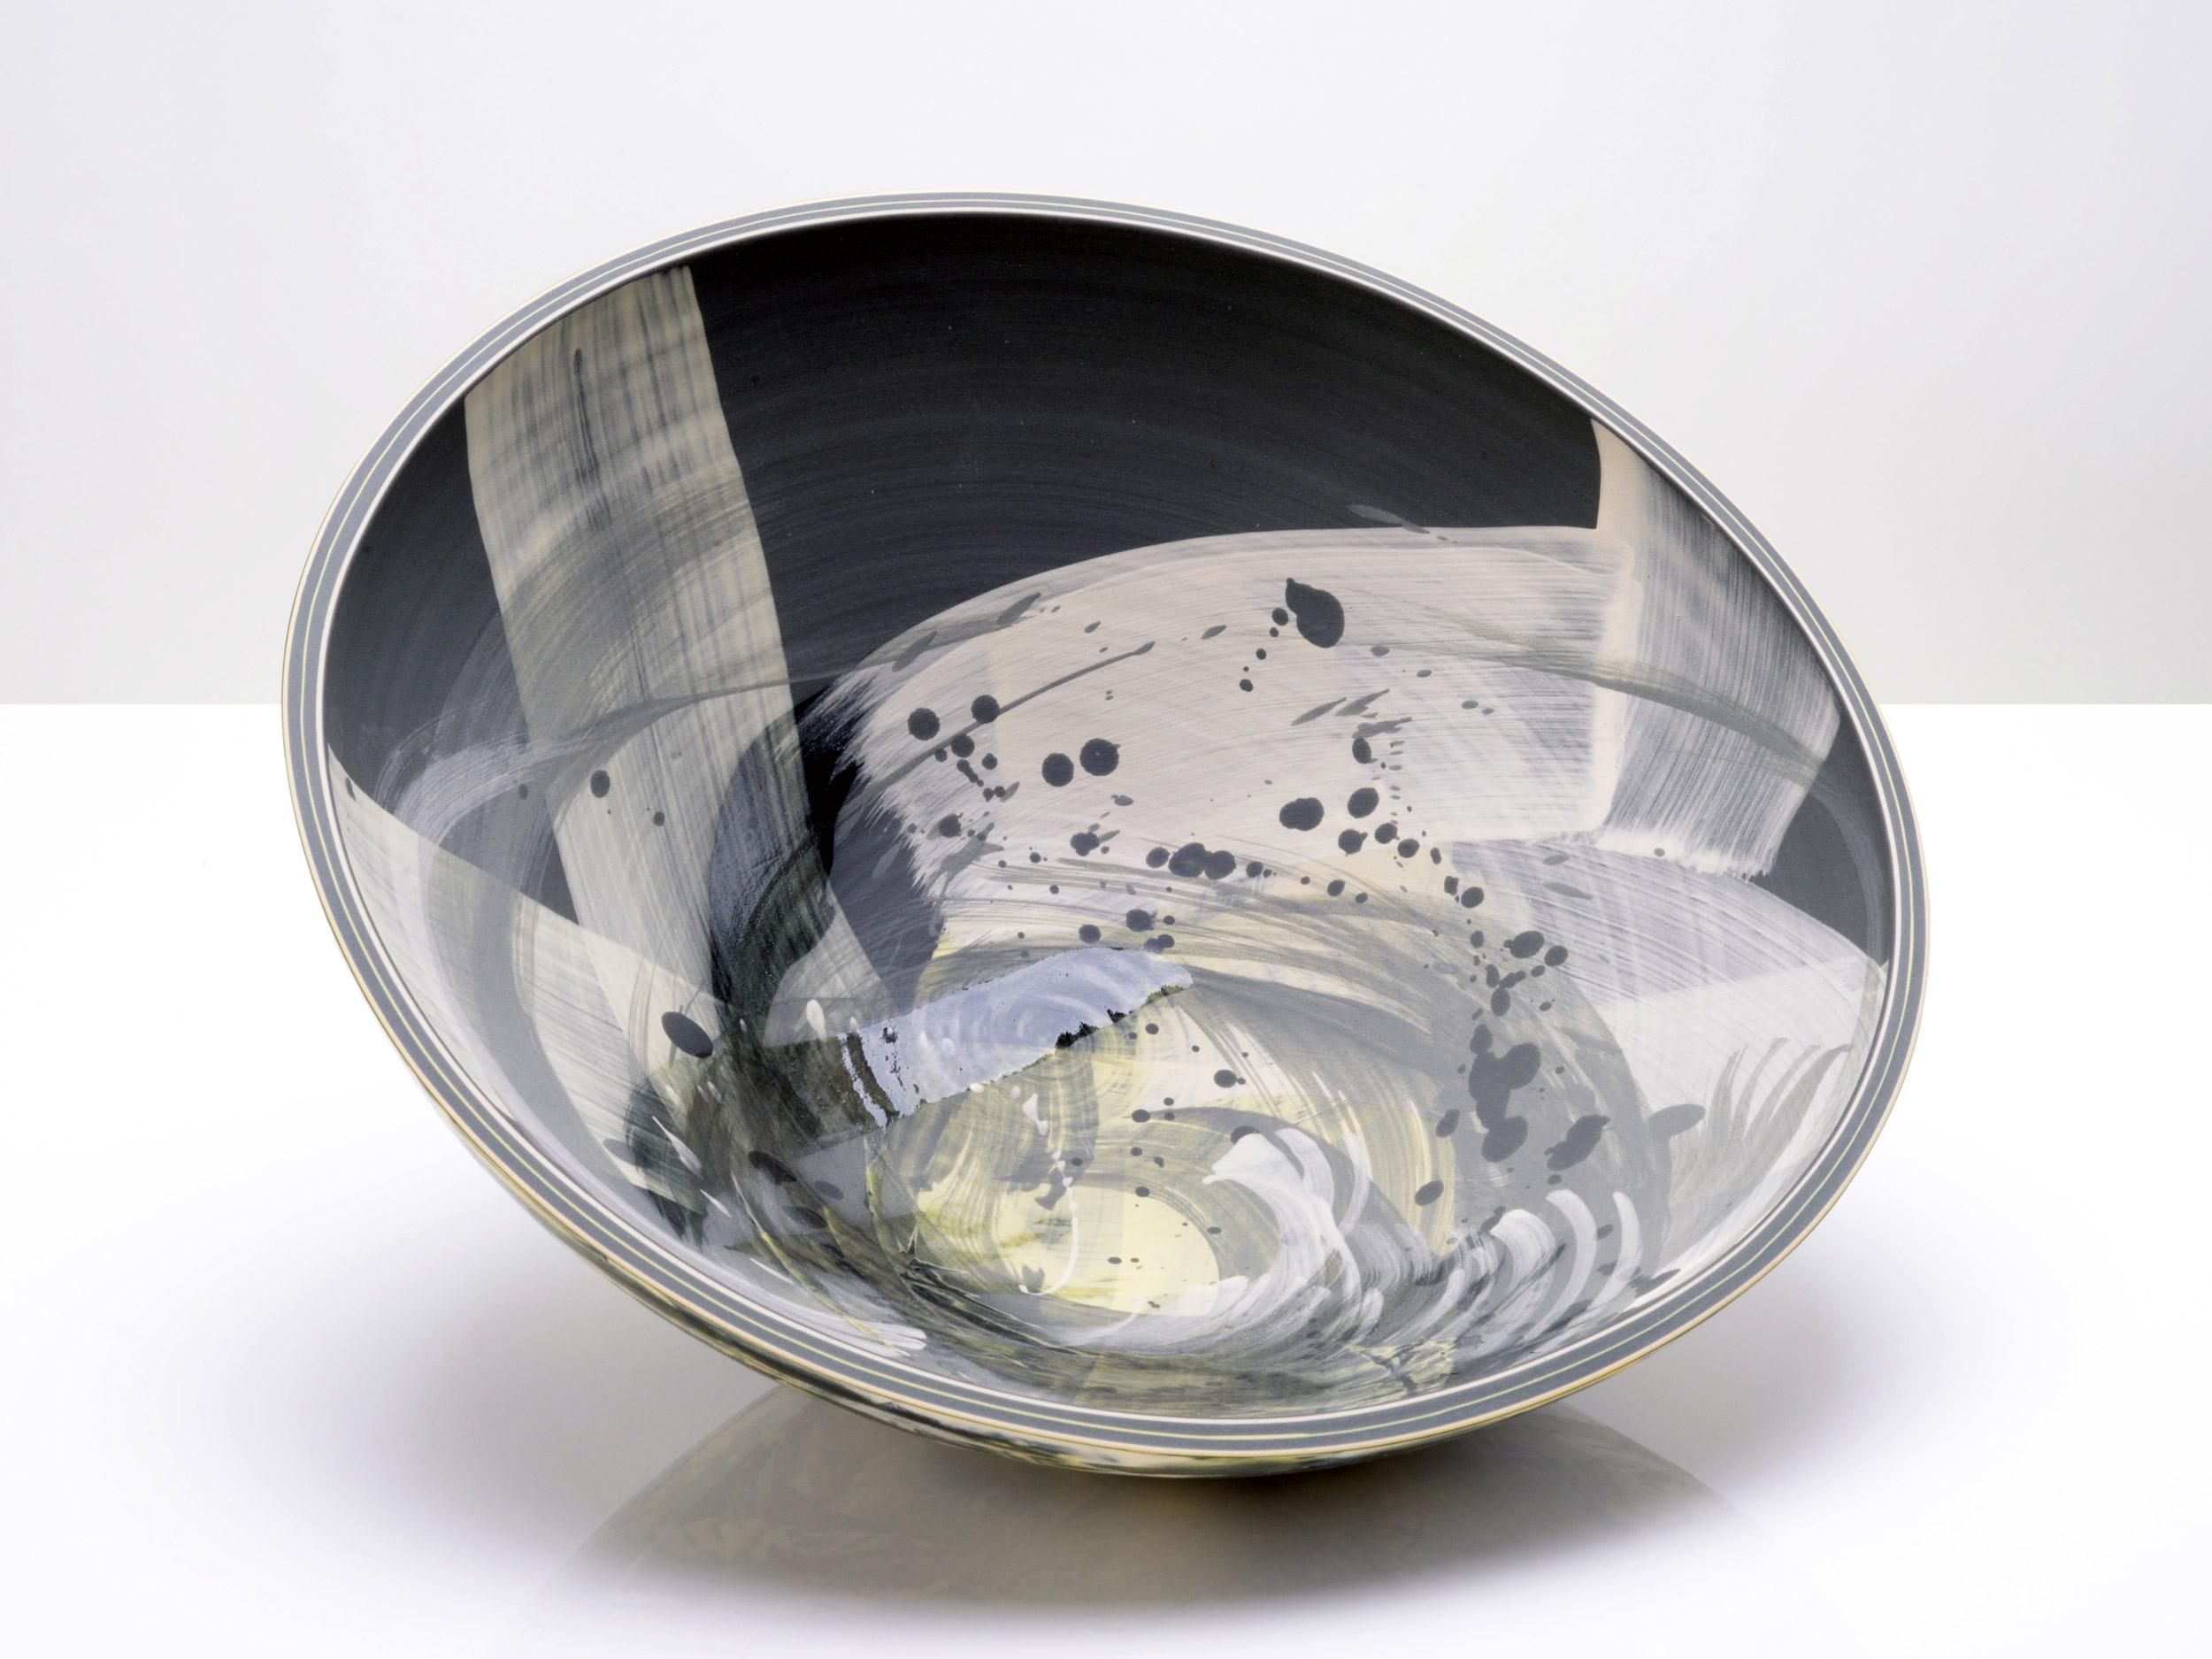 Nebula Art Inspiration Ceramics by Rowena Gilbert